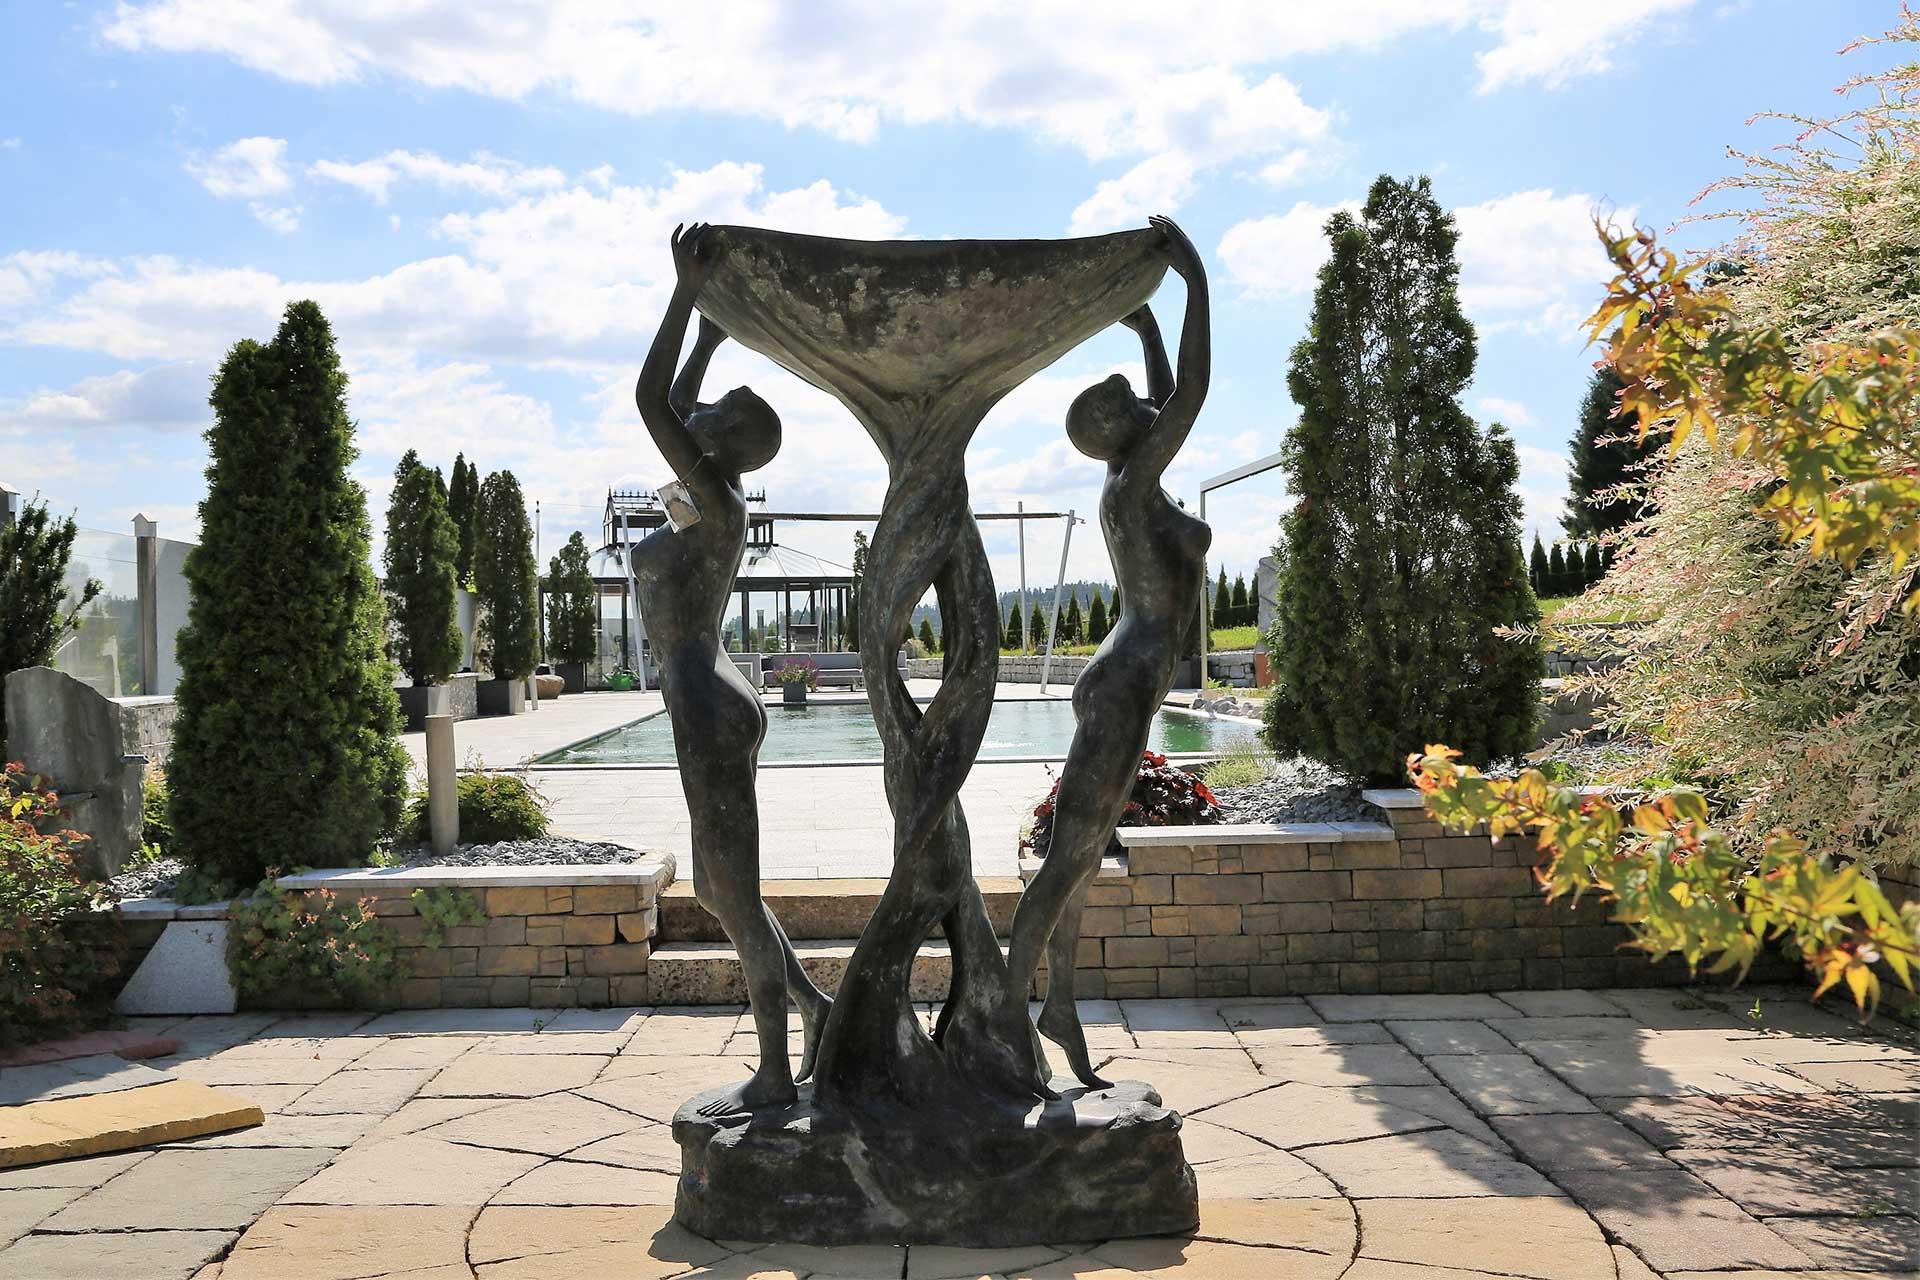 Full Size of Garten Skulpturen Gartenskulpturen Aus Stein Modern Skulptur Beton Buddha Kaufen Metall Rost Schweiz Holz Berlin Steinguss Rostigem Eisen Essgruppe Garten Garten Skulpturen